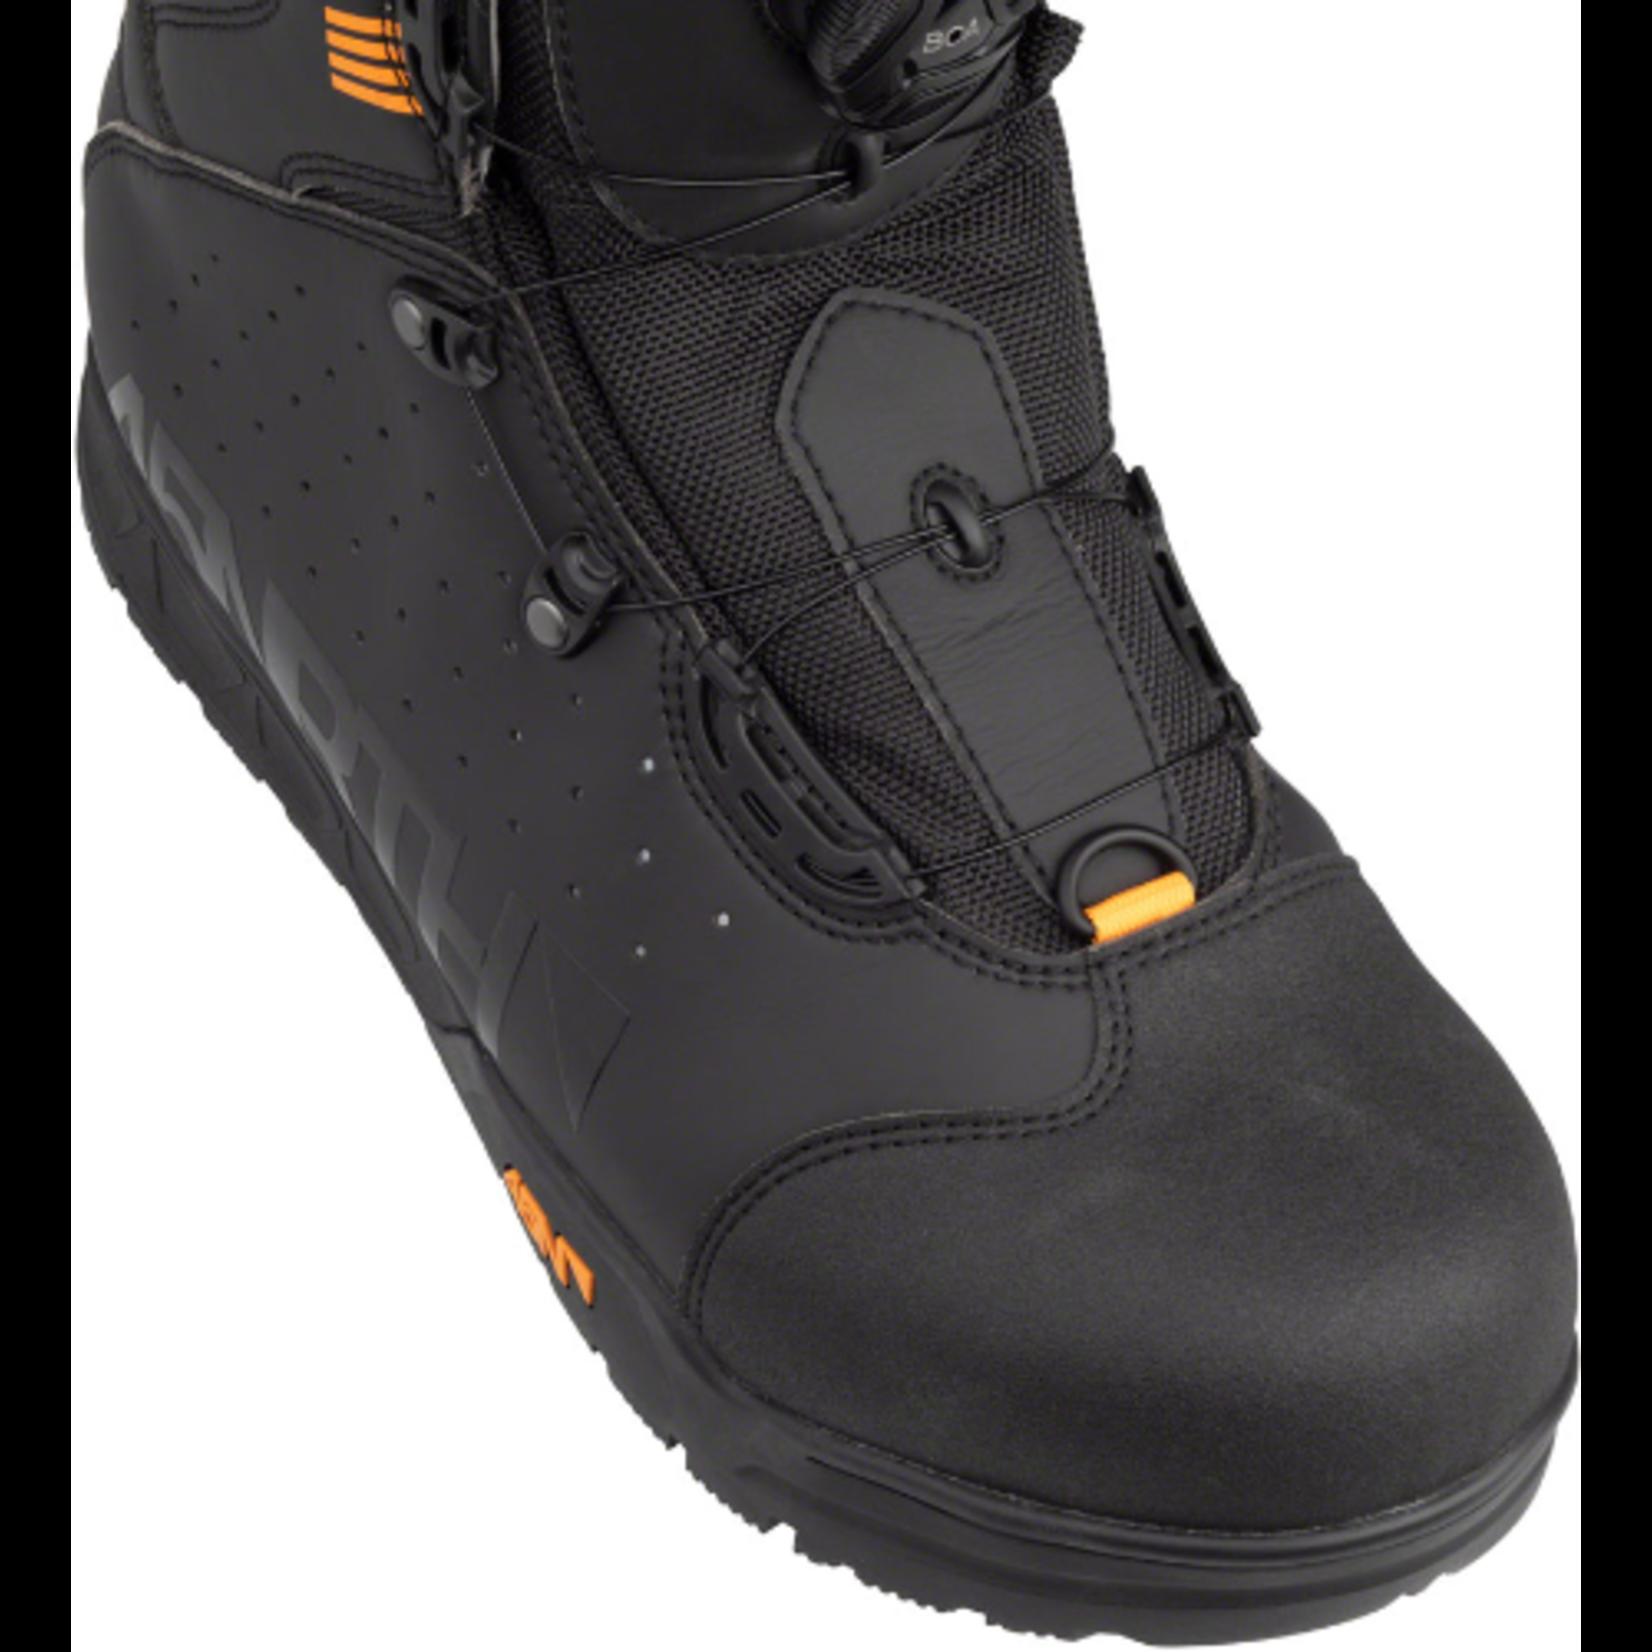 45NRTH 45NRTH Wölvhammer: Black Size 37